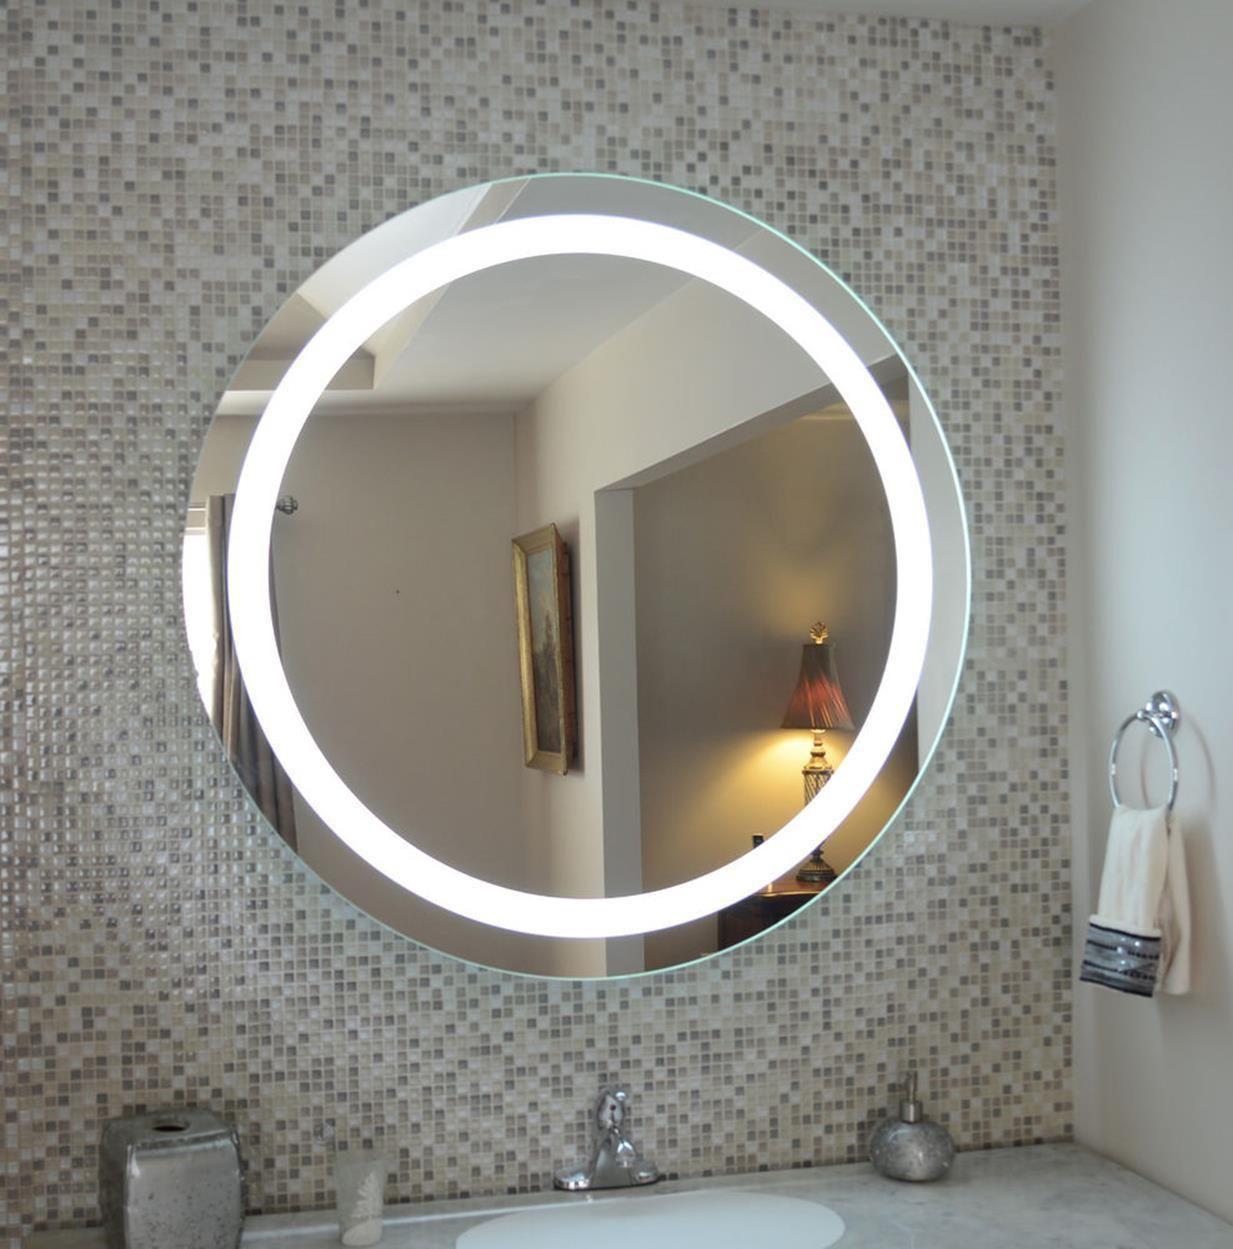 35 Stunning Bathroom Vanity Mirrors With Light Designs Fancy Bathroom Round Mirror Bathroom Mirror Wall Bathroom